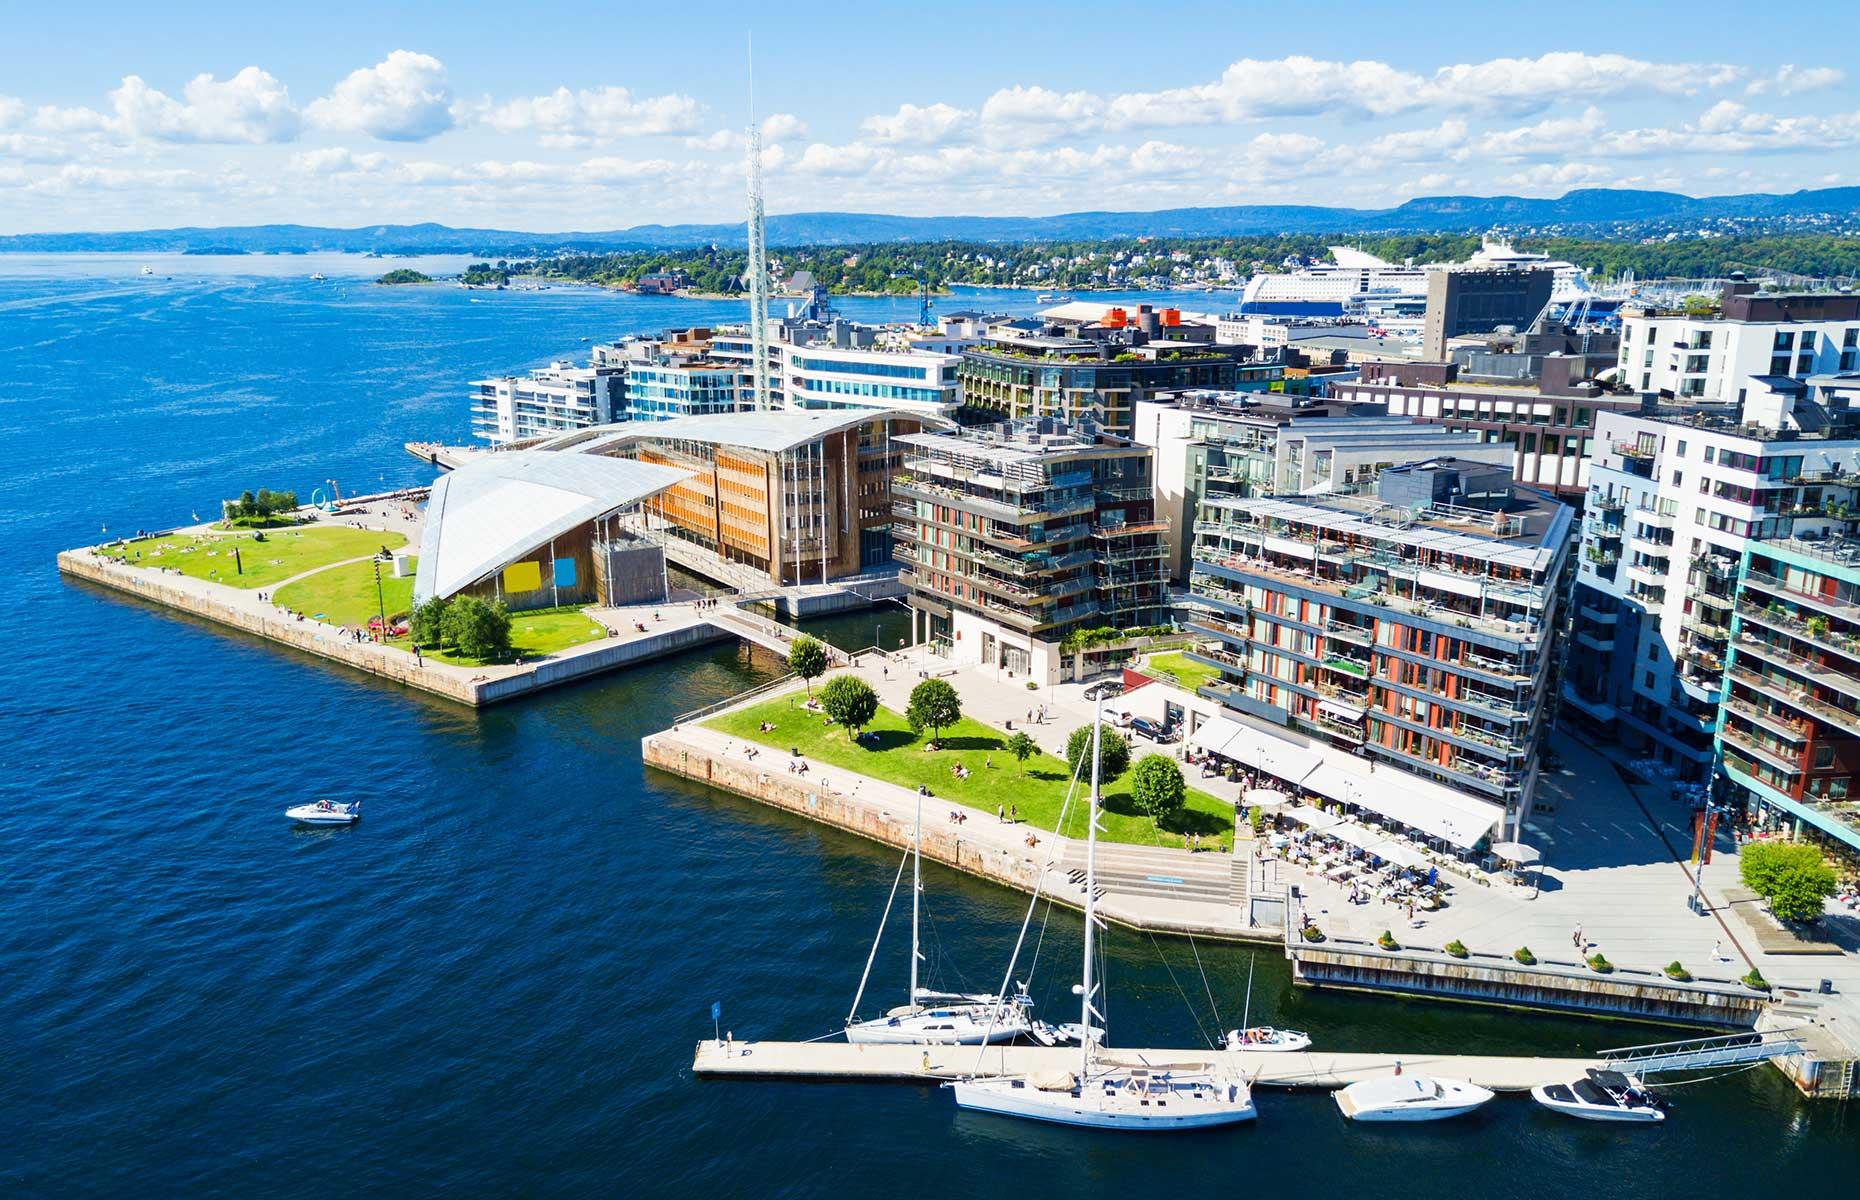 Oslo harbour (Image: saiko3p/Shutterstock)